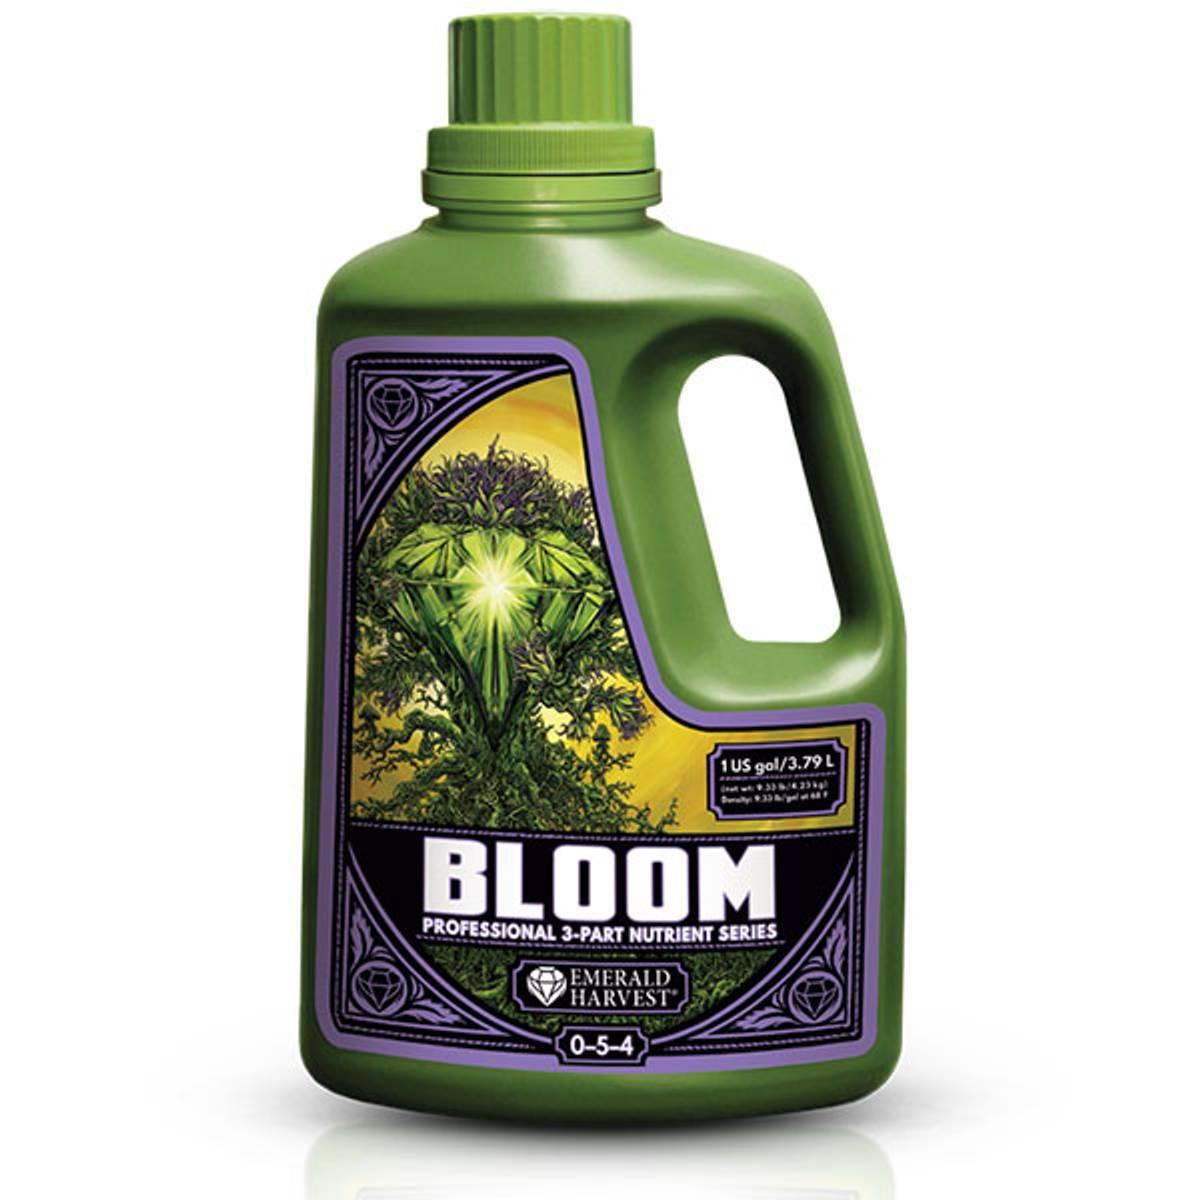 Bloom 3,79 L, Emerald Harvest